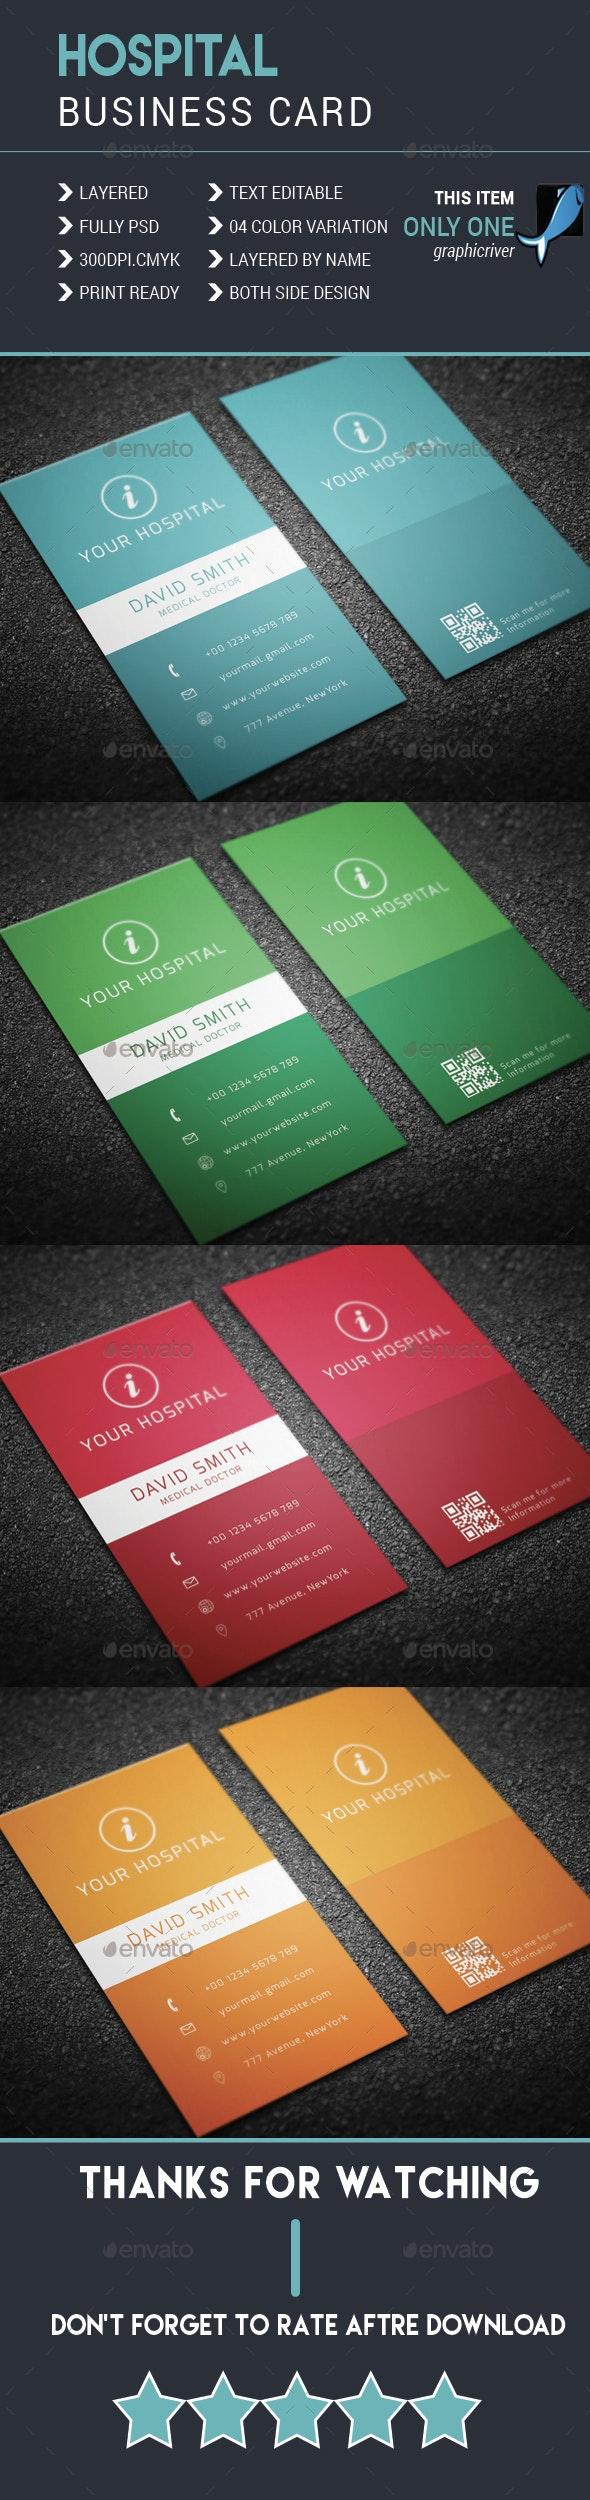 Hospital Business Card - Business Cards Print Templates